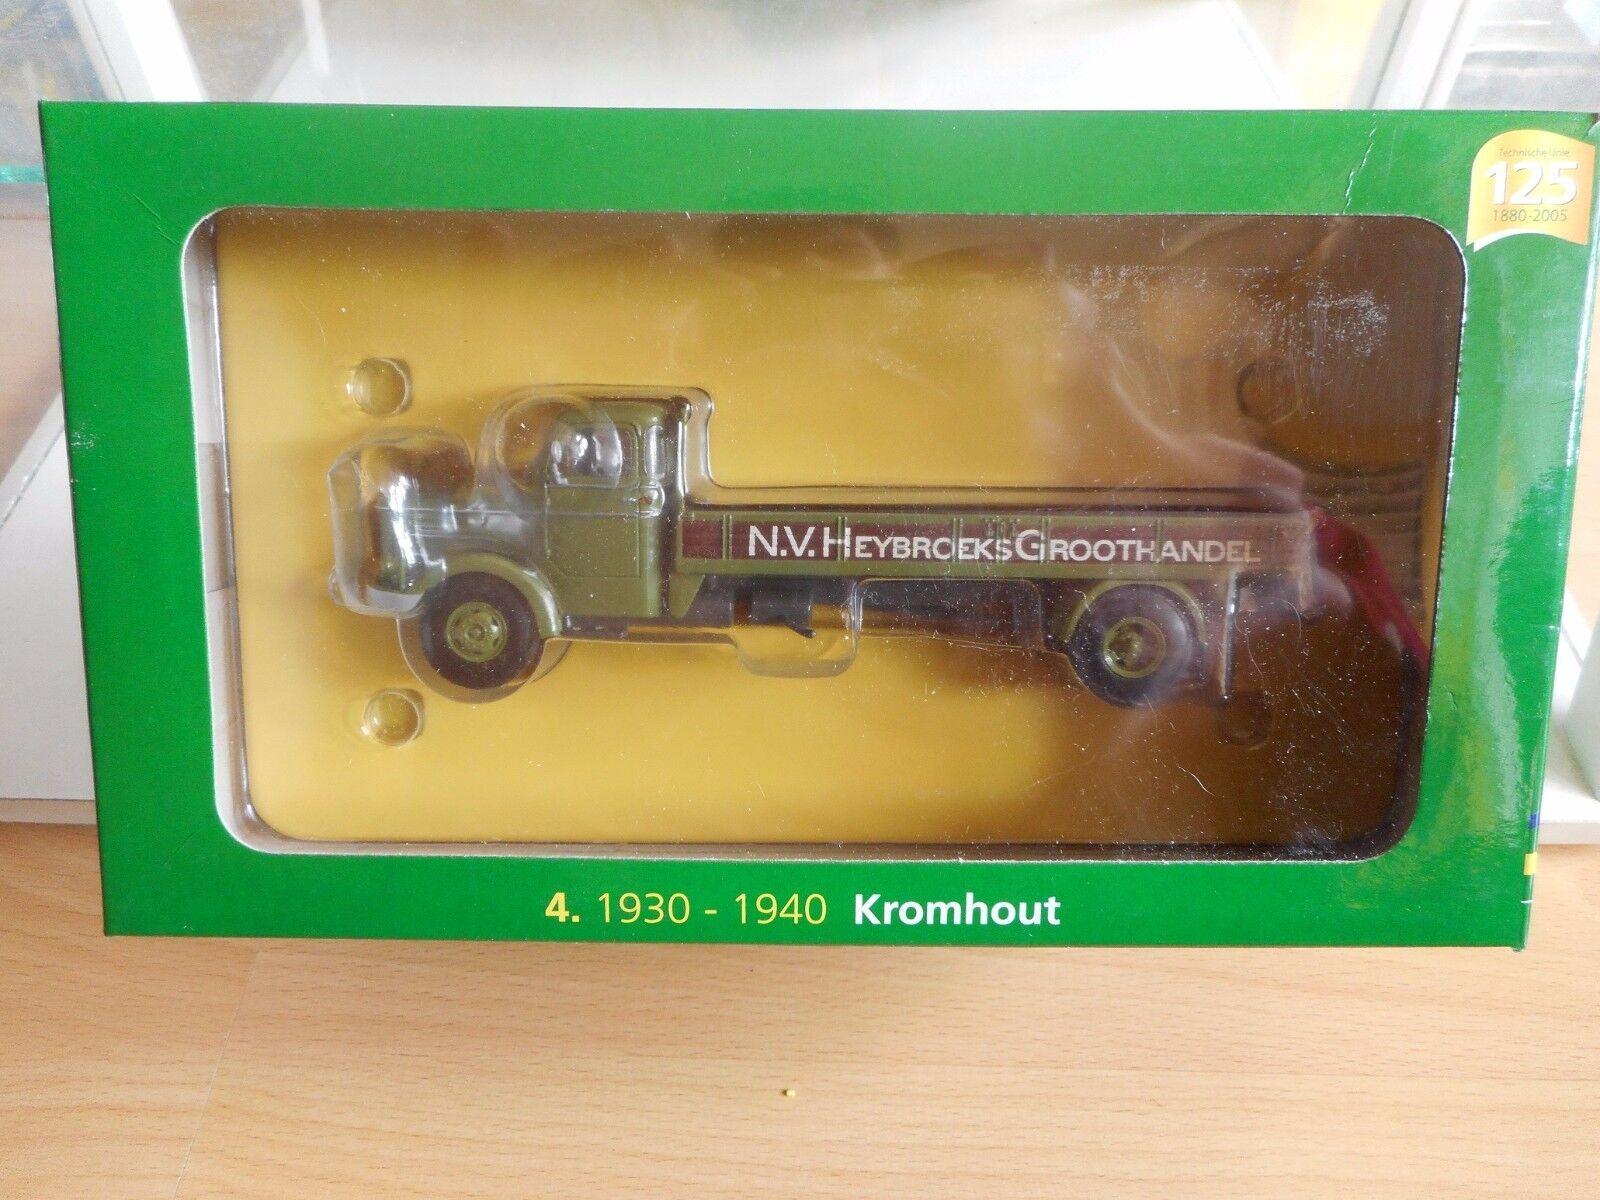 Lion Toys Kromhout  NV Heybroeks Groothandel  in verde Marronee on 1 50 in Box